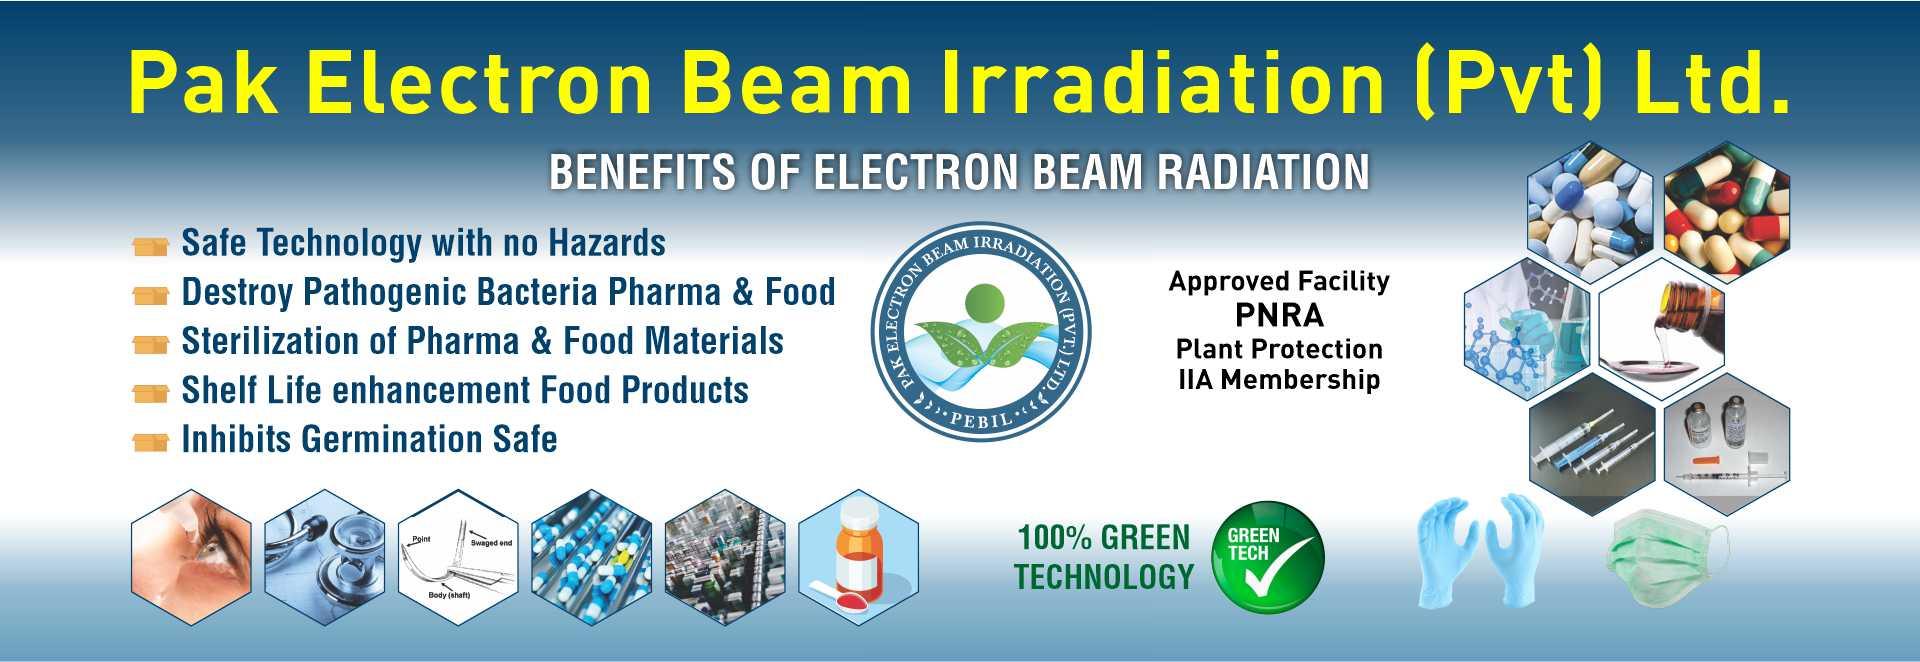 Benefits of Electron Beam Irradiation